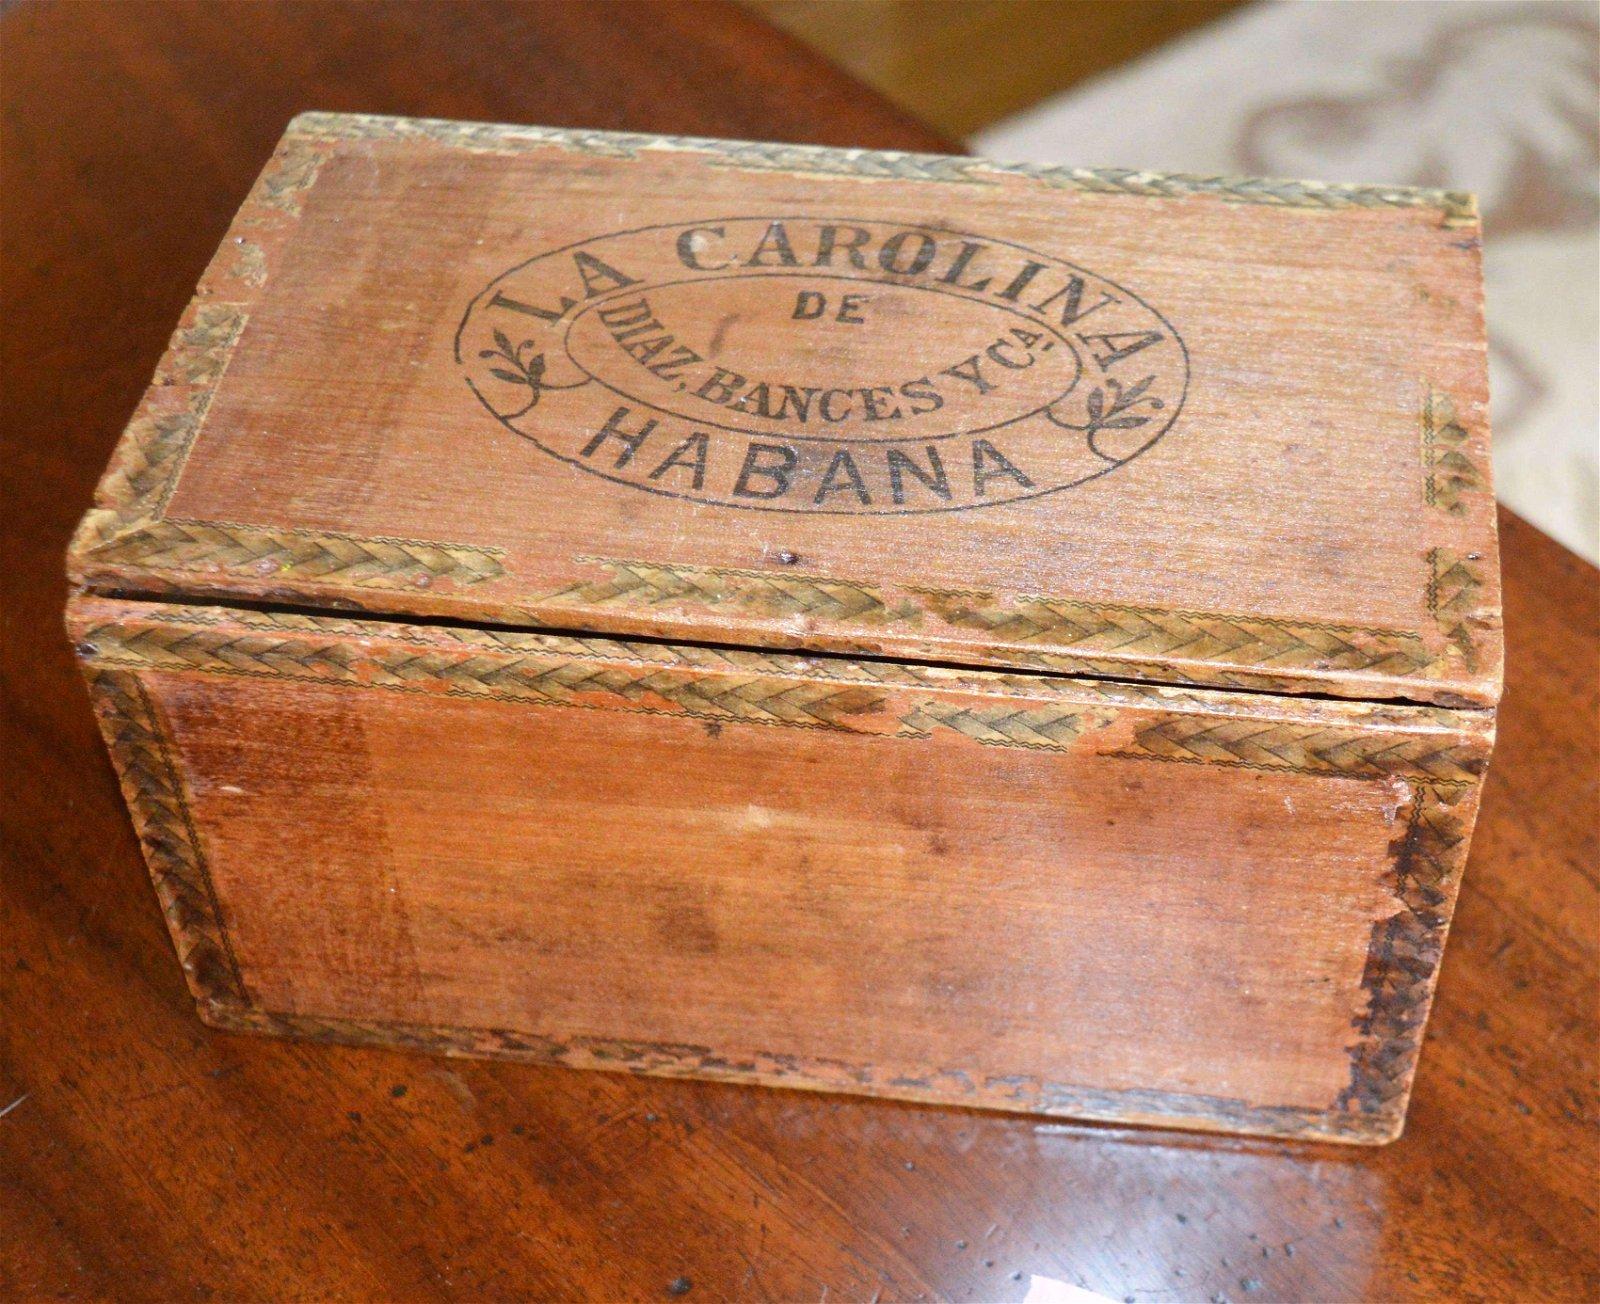 Antique La Carolina Cuban cigar box with label inside.